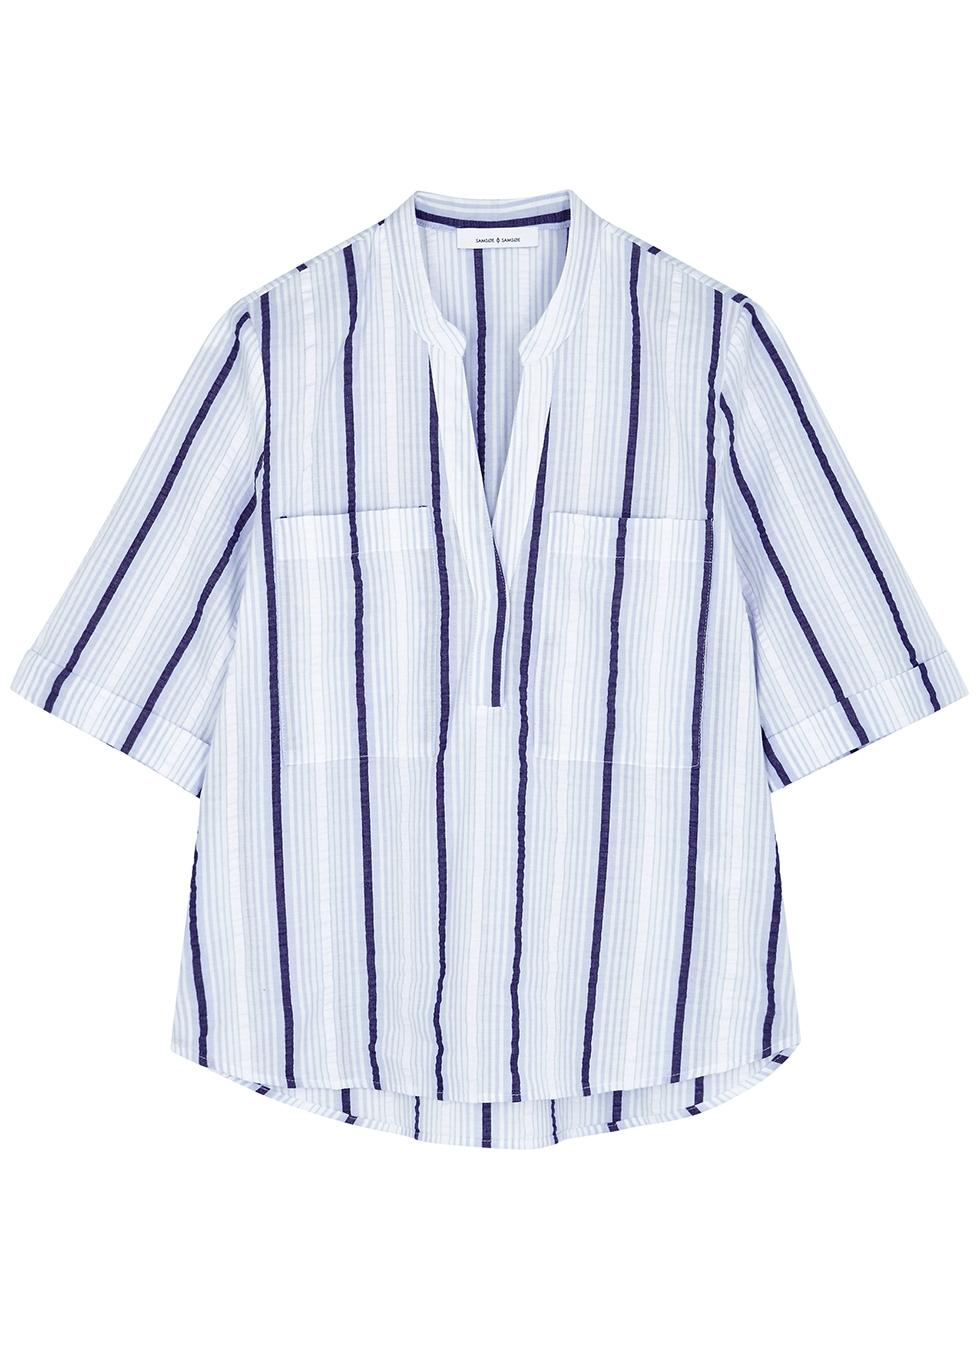 Shamil blue cotton shirt - Samsøe & Samsøe